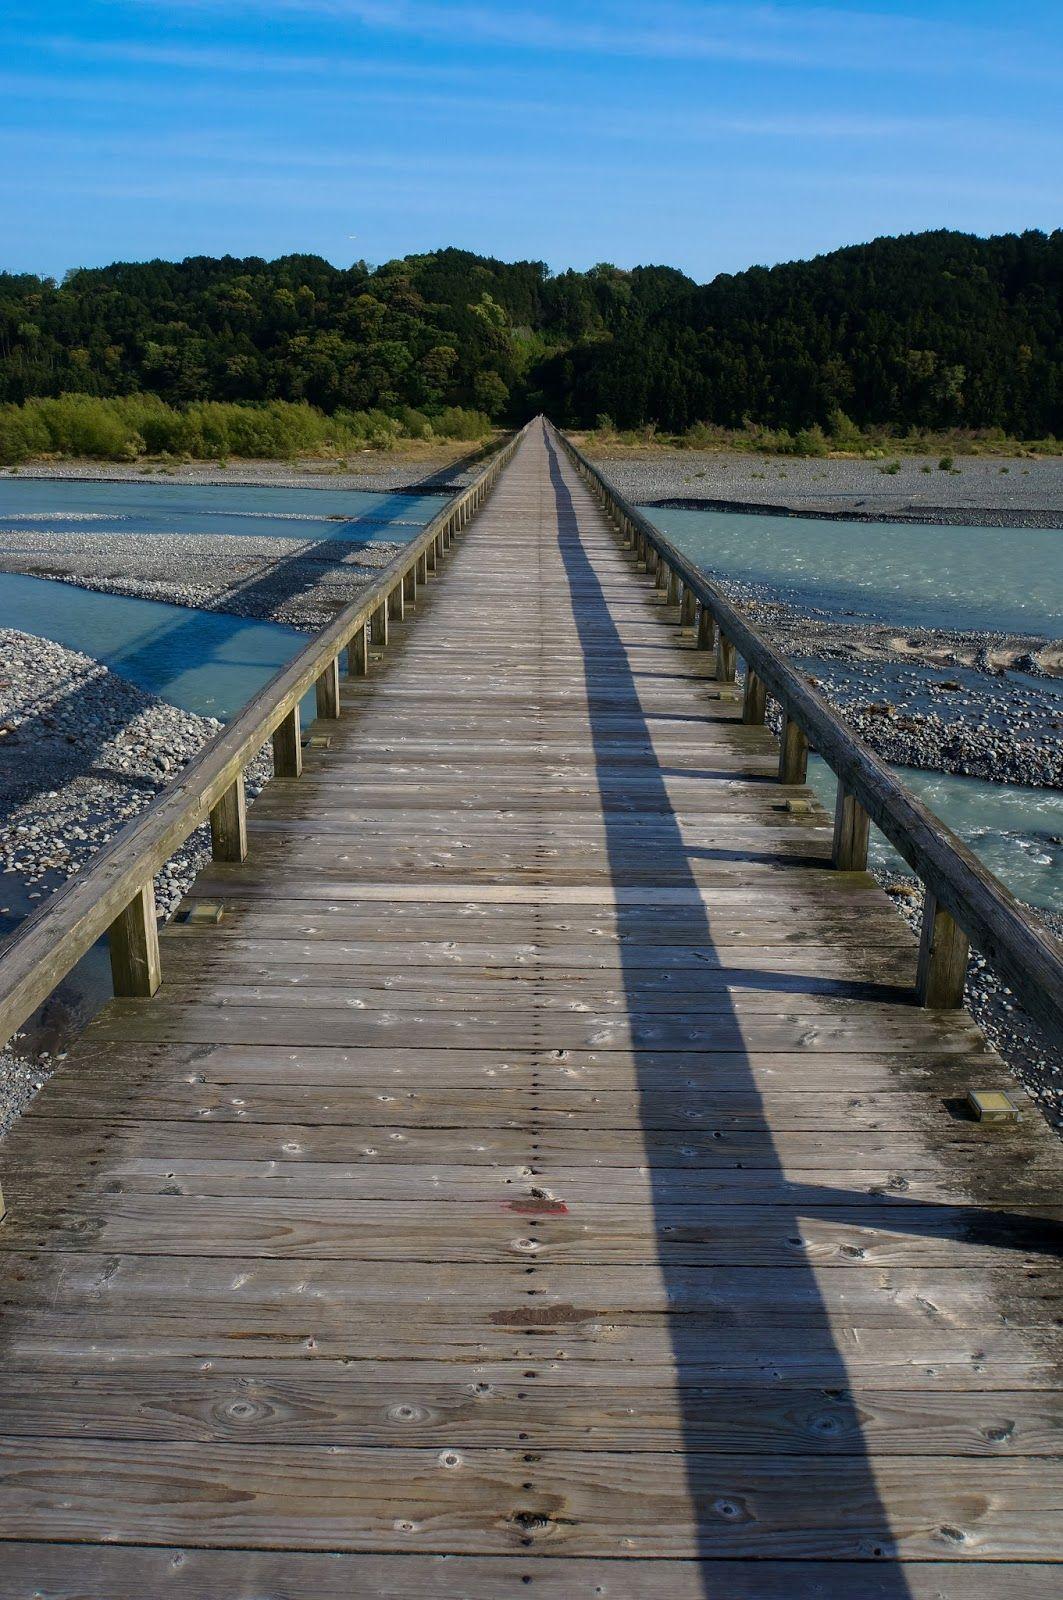 Horai-bashi bridge: The longest wooden constructed pedestrian bridge in the world